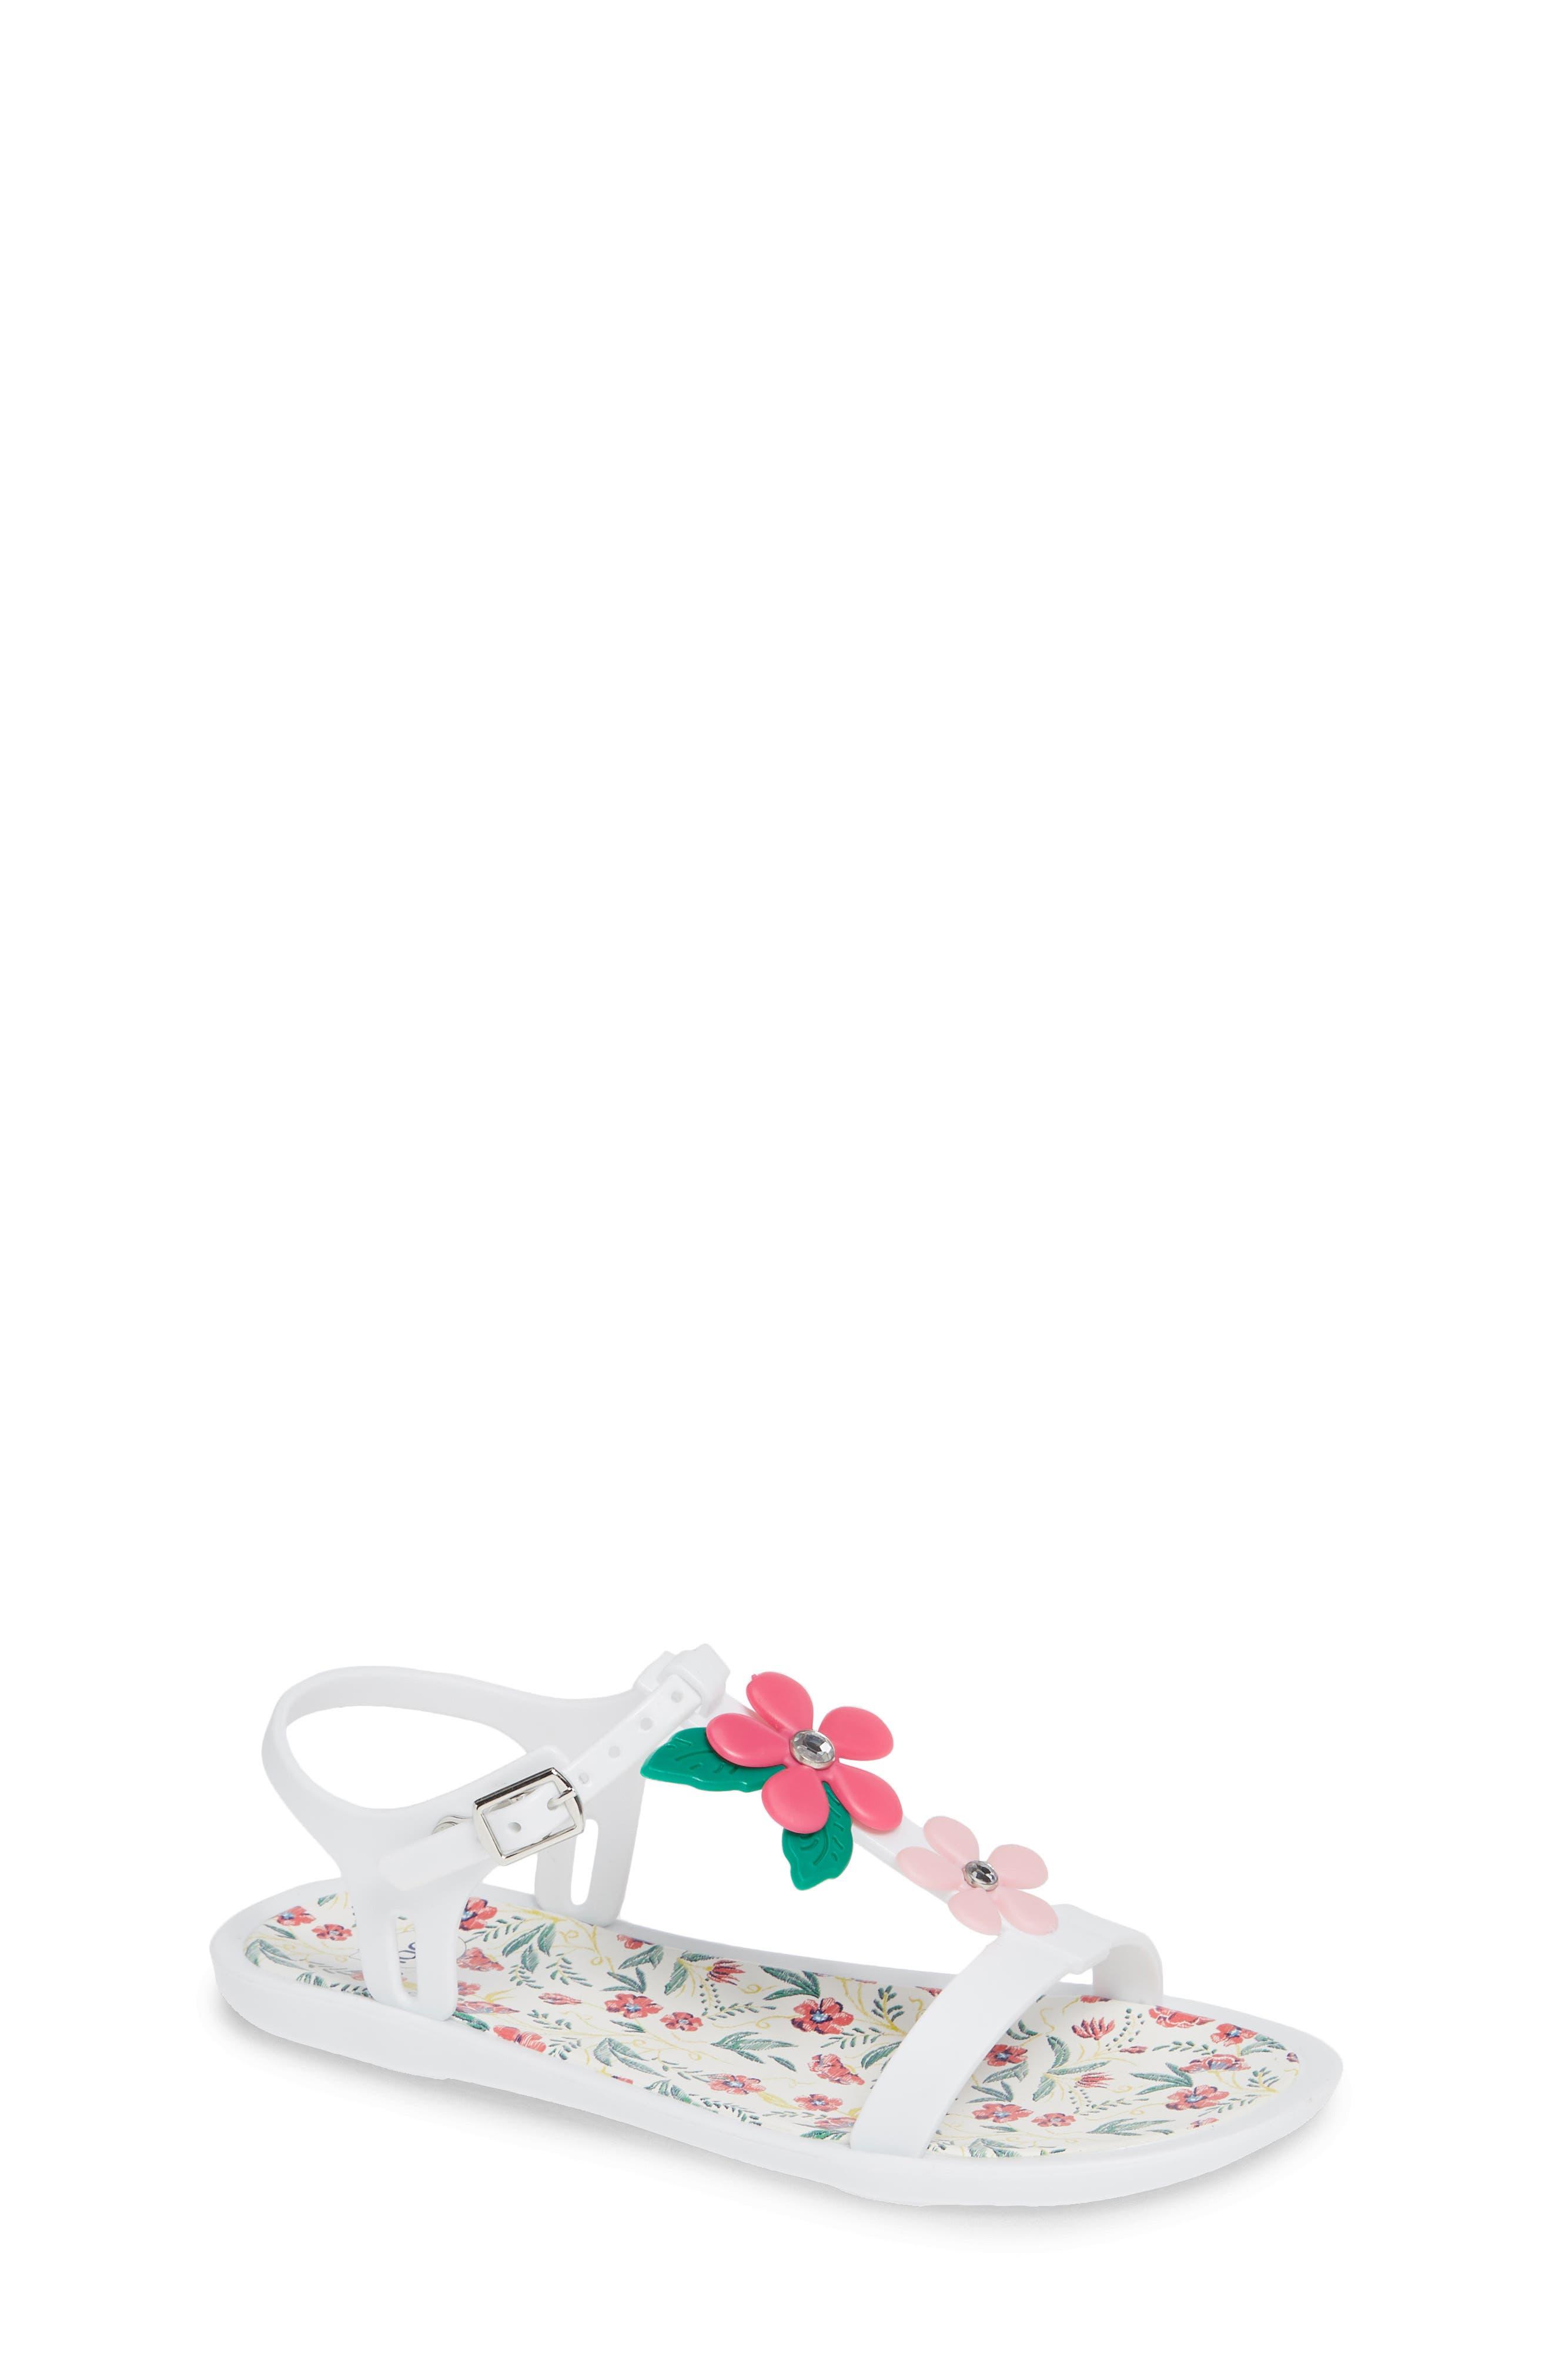 Tricia Floral T-Strap Sandal,                         Main,                         color, White